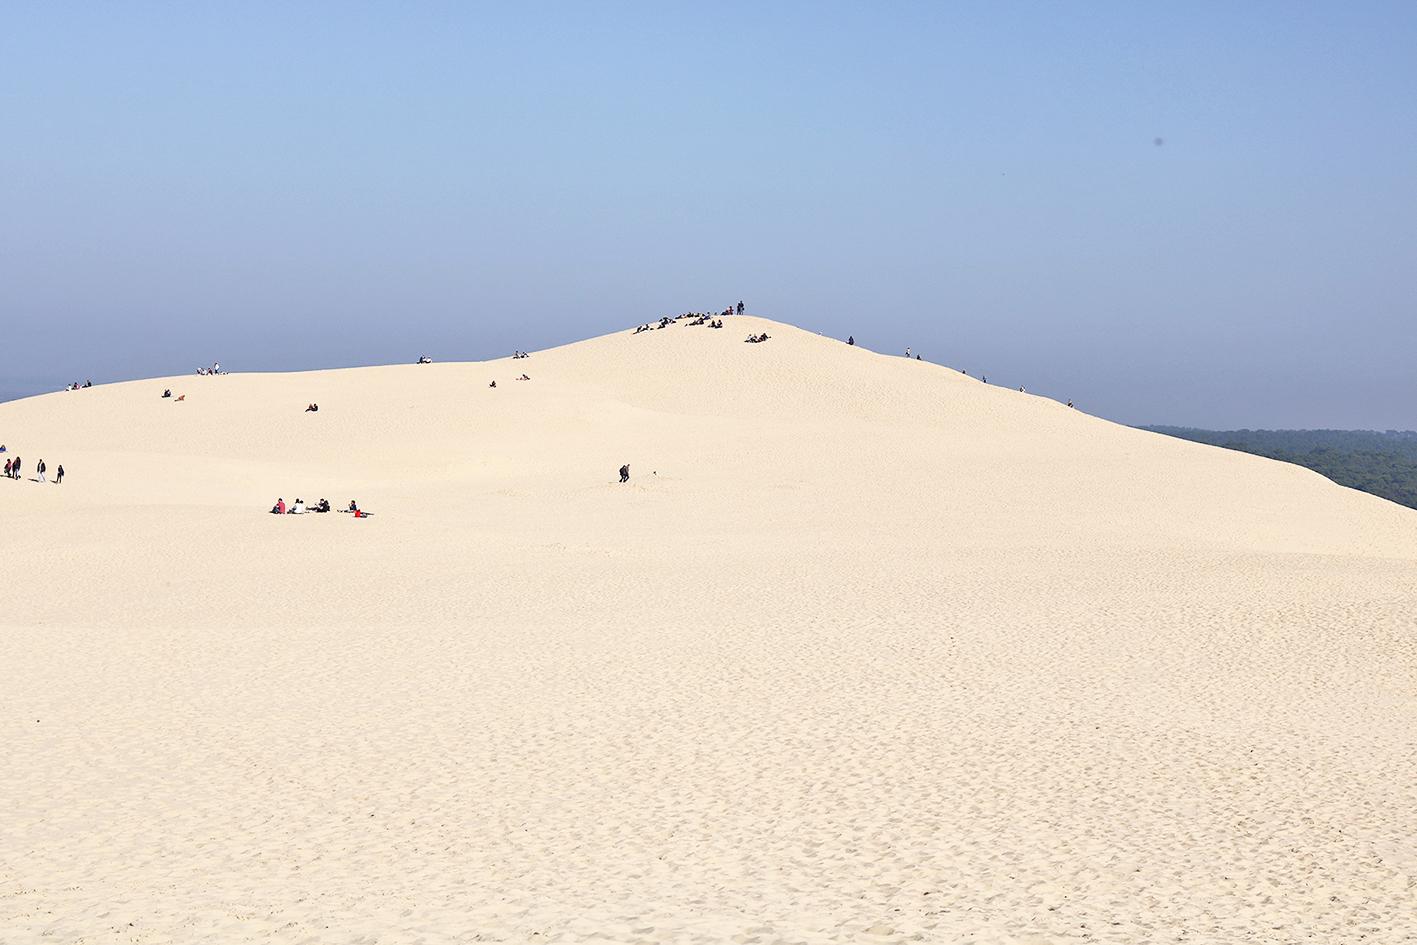 dune-du-pilat-photo